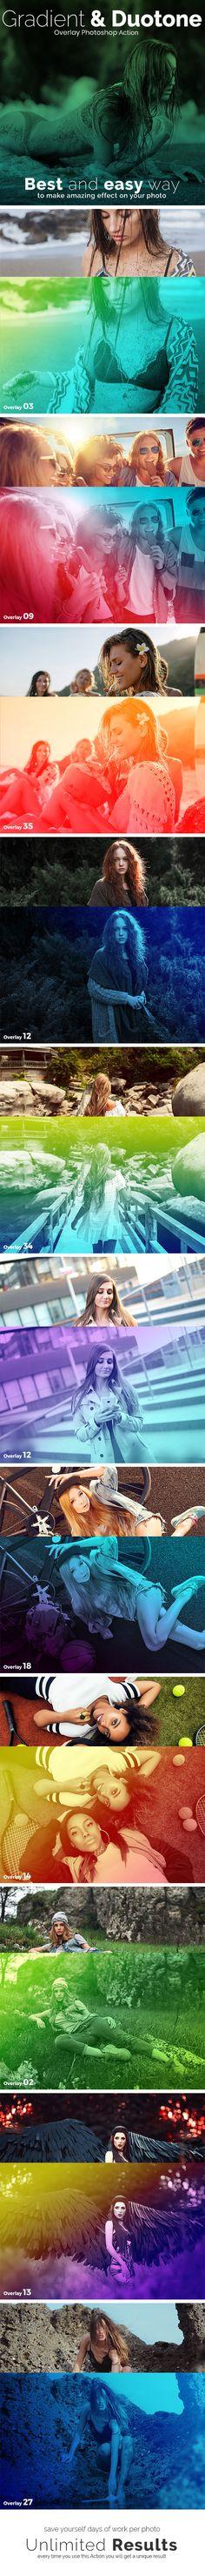 Gradient & Duotone Overlay Photoshop Action